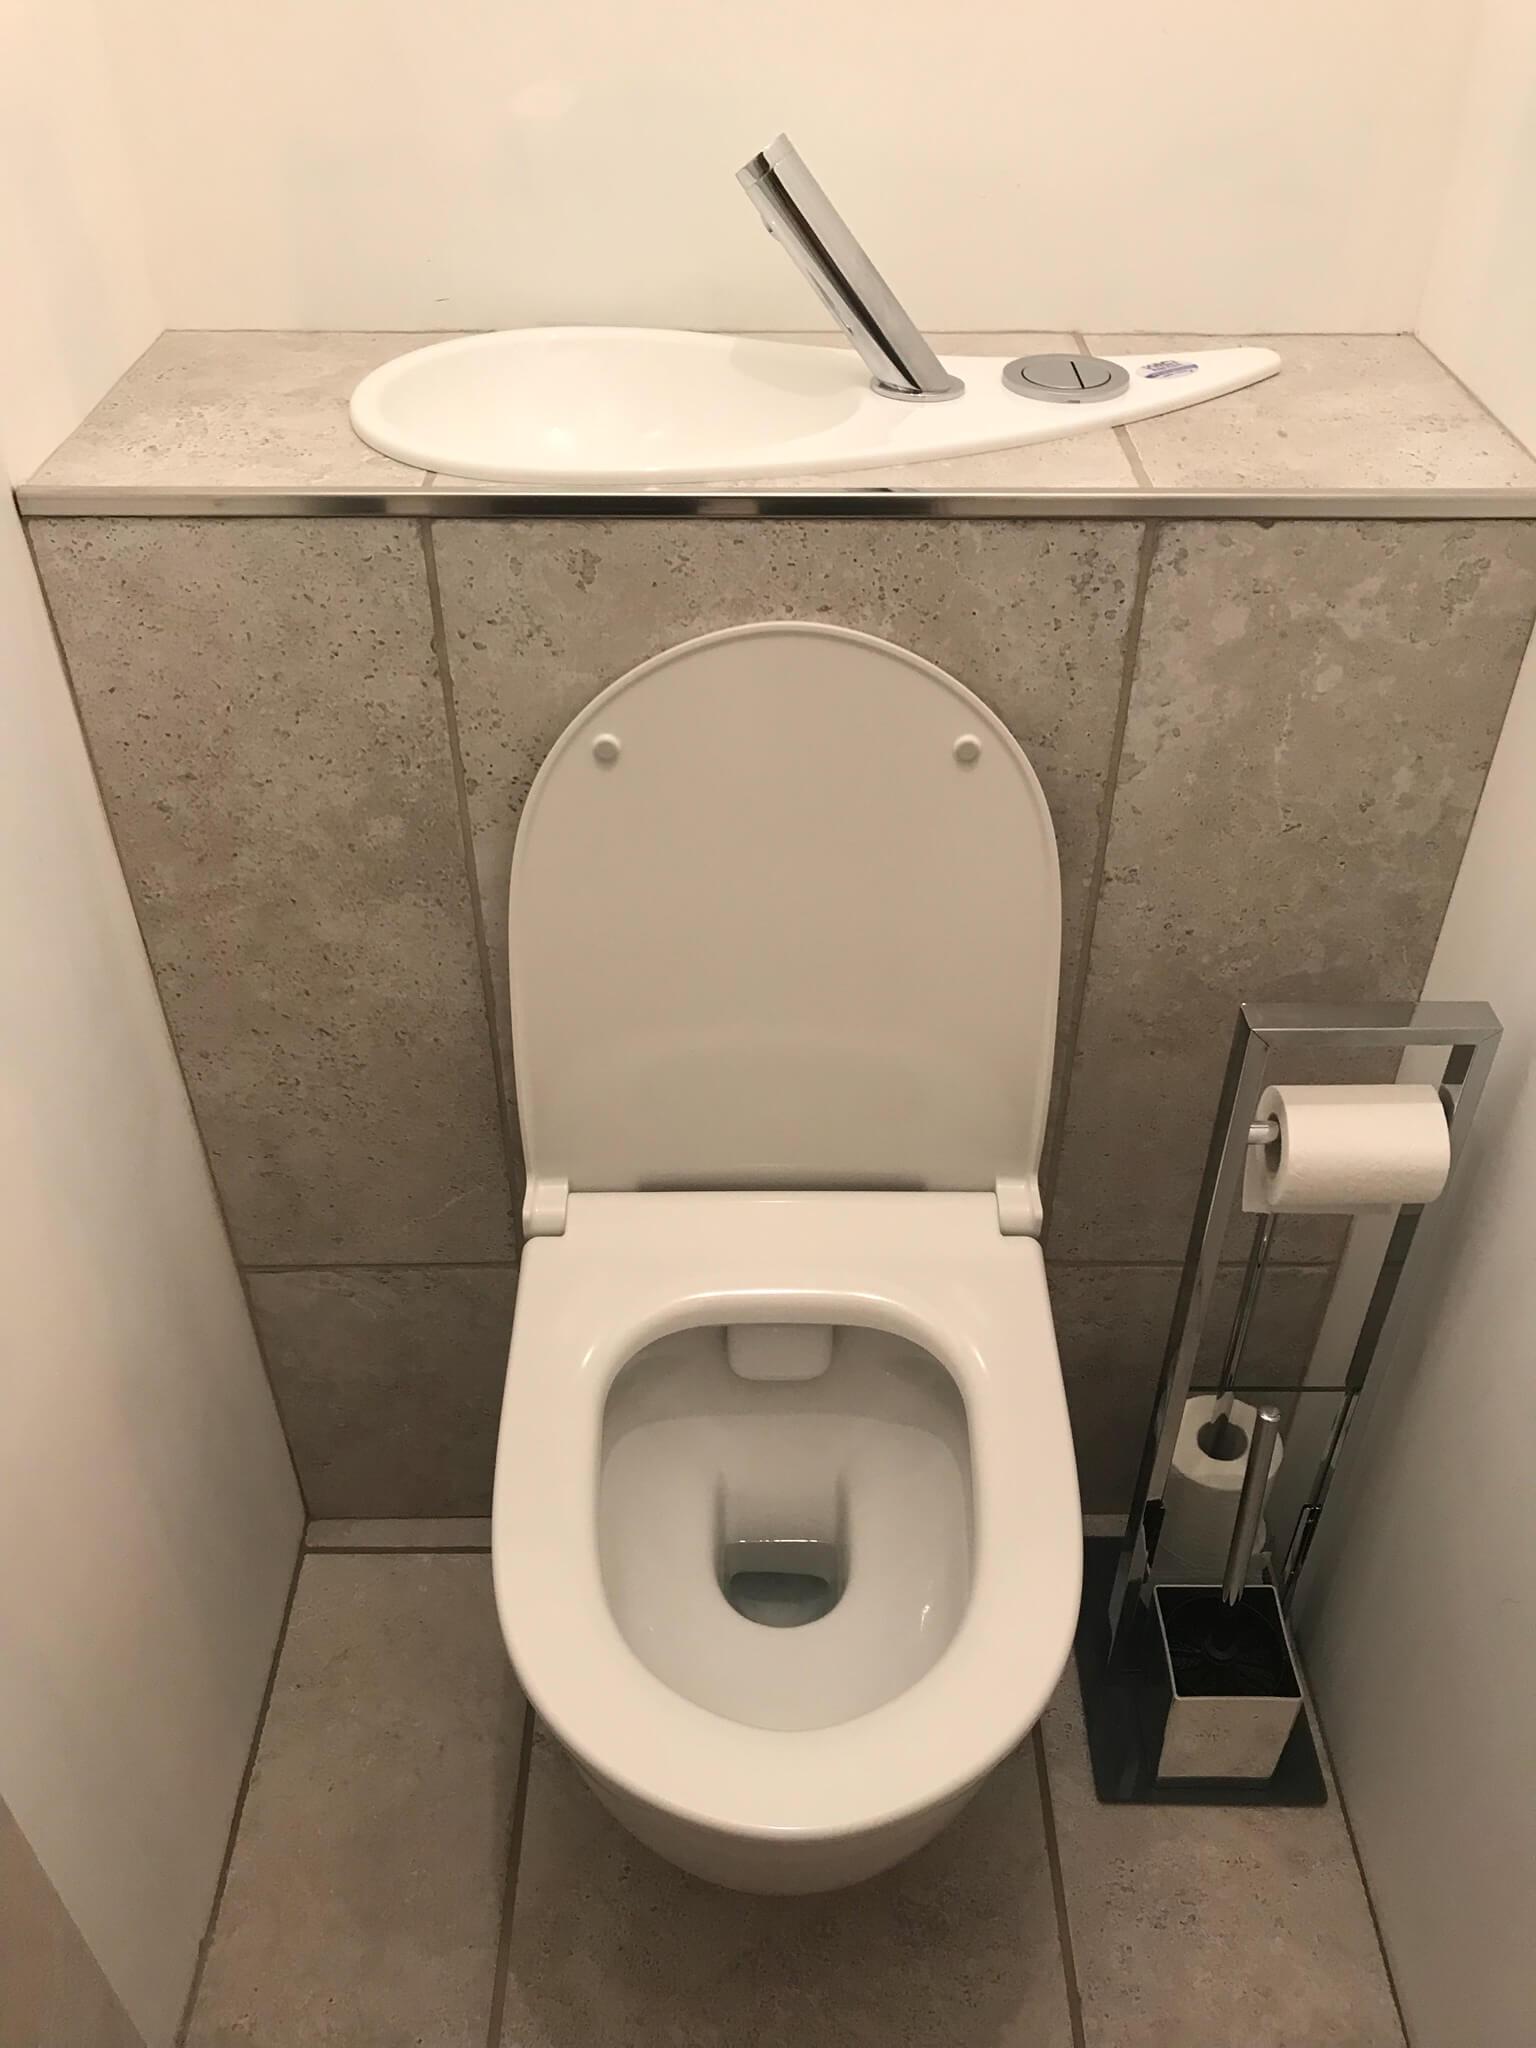 Largeur Wc Suspendu Geberit wc suspendu geberit avec lave-mains design intégré | wici